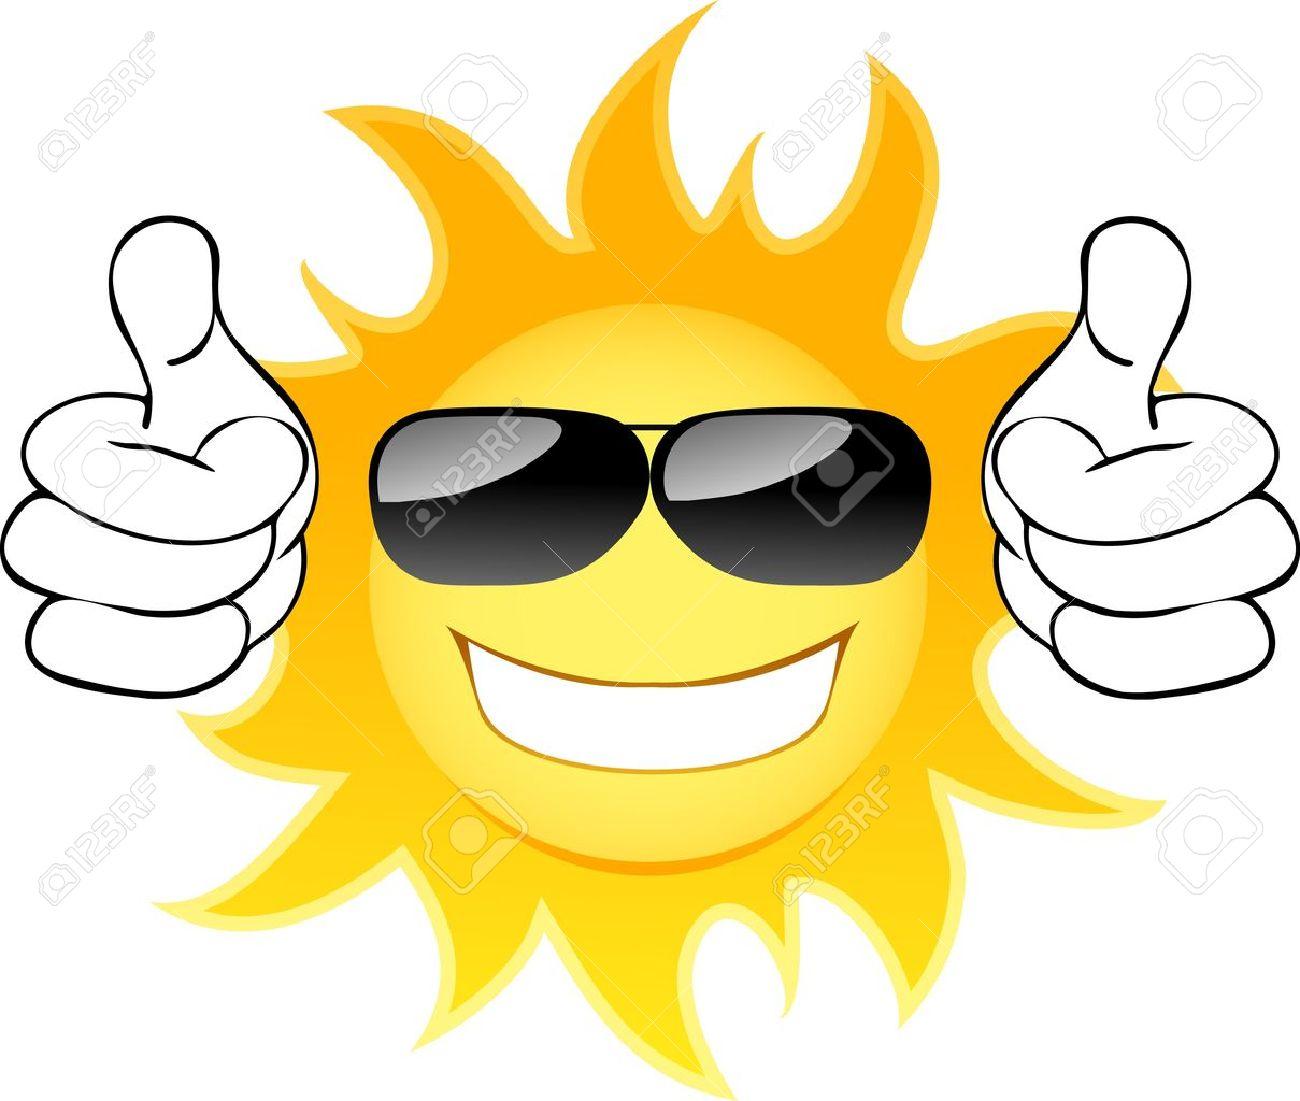 https://previews.123rf.com/images/profyart/profyart1205/profyart120500010/13630084-Sourire-soleil-avec-des-lunettes-Vector-illustration-Banque-d'images.jpg